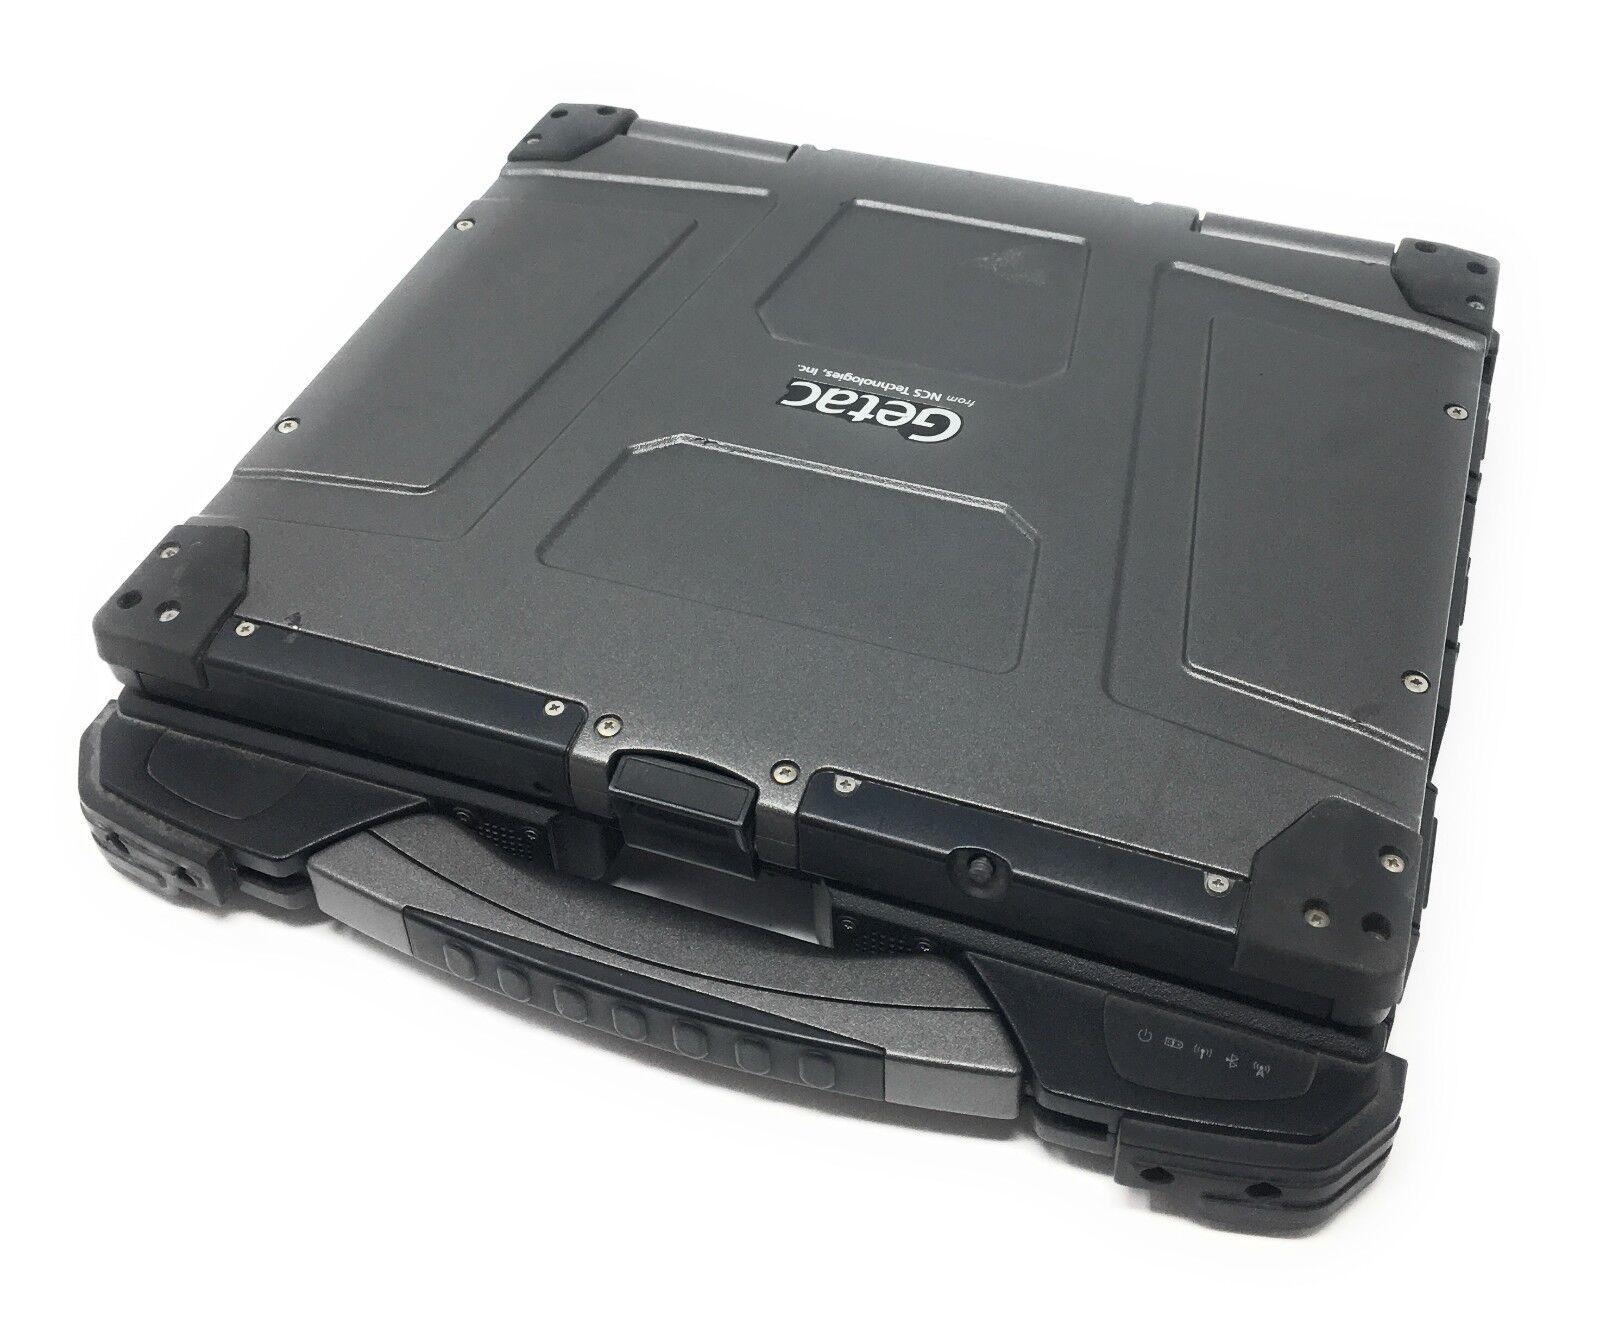 Getac B300-X Rugged Core i7 2GHz 4GB RAM Backlit Keyboard Laptop Notebook B300X